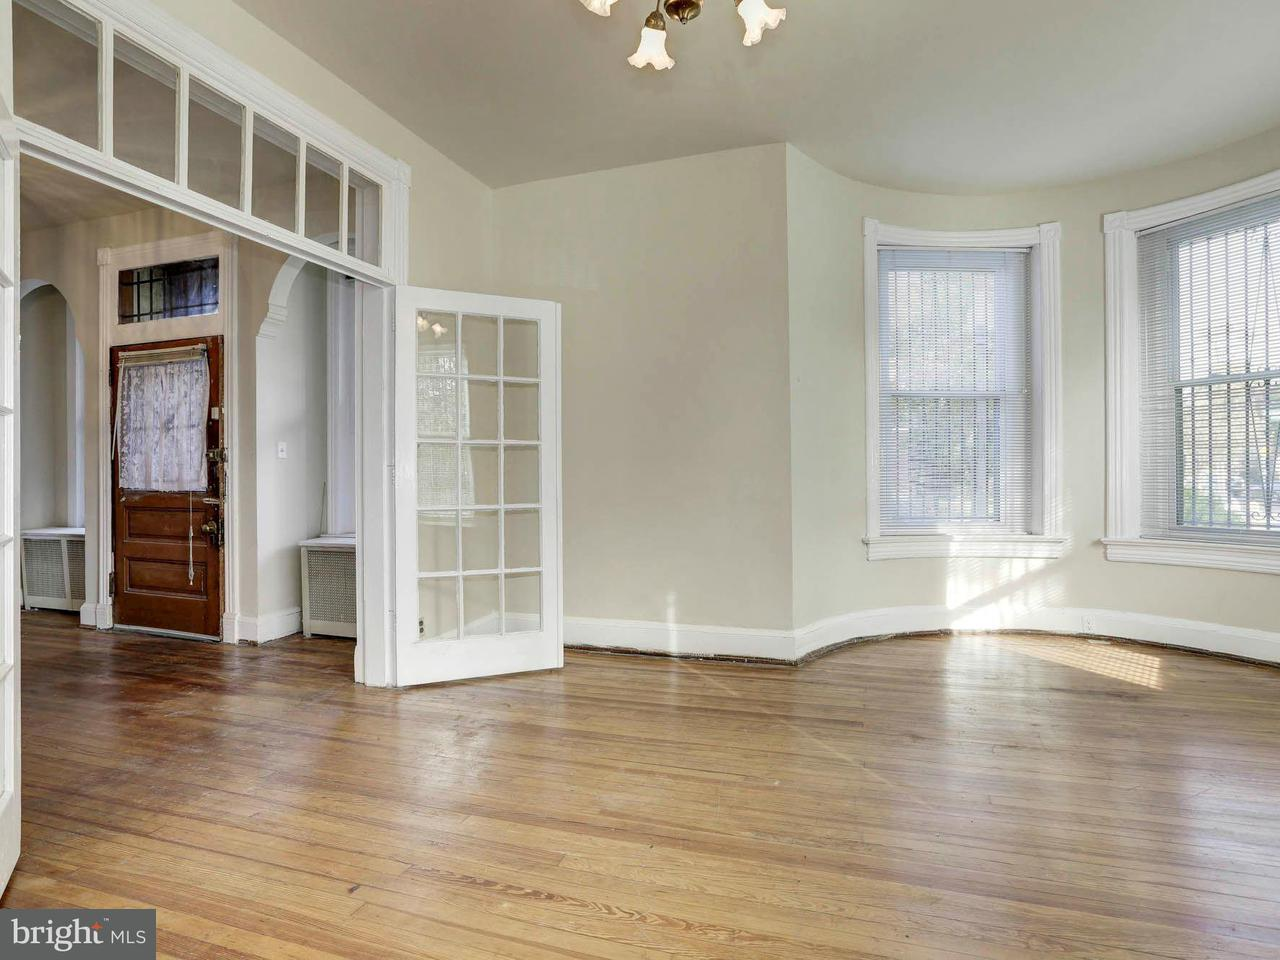 Additional photo for property listing at 1700 1st St Ne 1700 1st St Ne 华盛顿市, 哥伦比亚特区 20002 美国